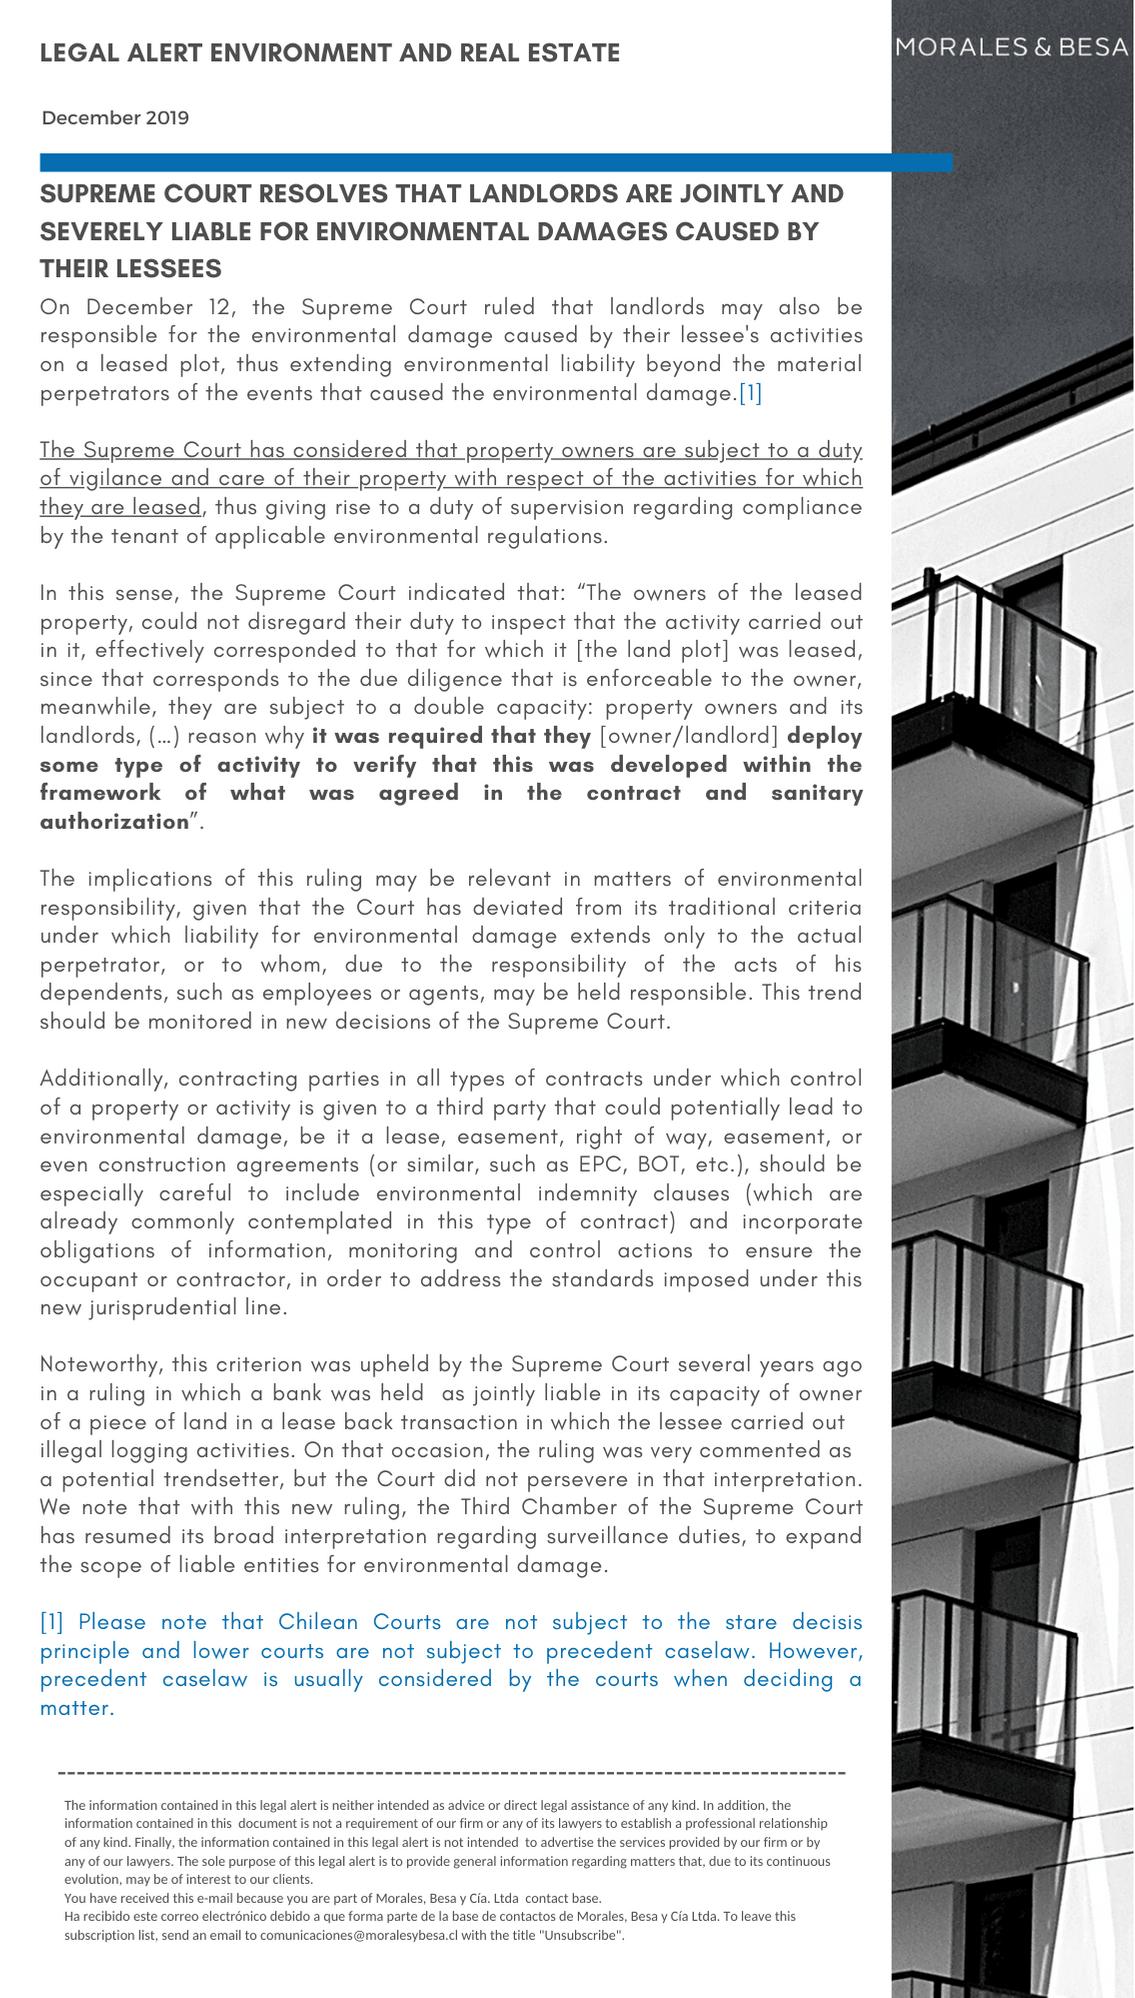 Alerta Legal M&B - Energía - Noviembre 2019